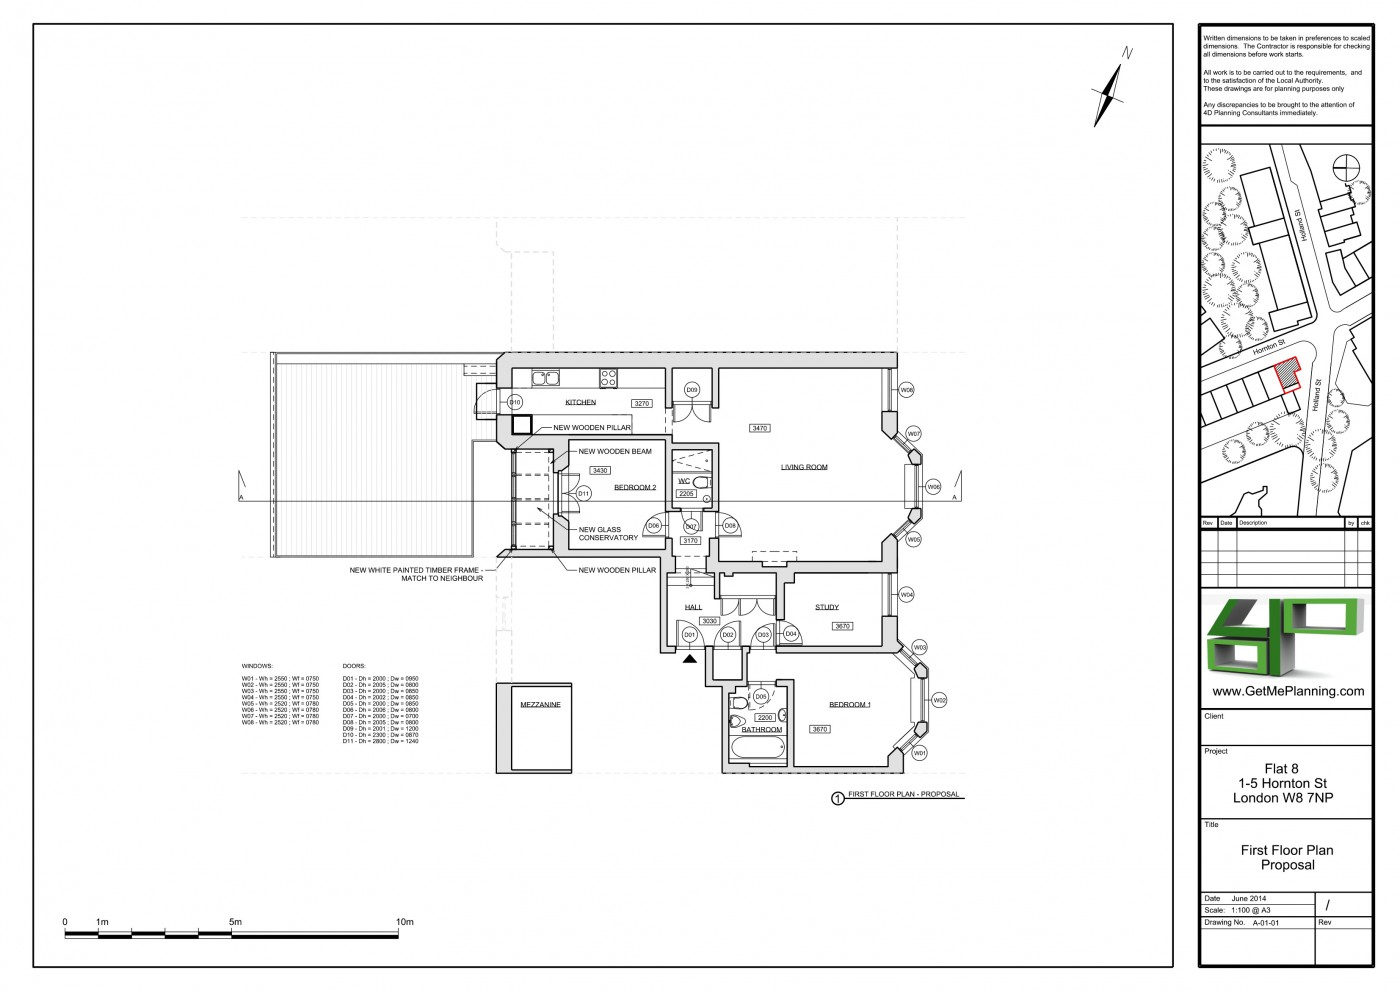 development application 1-5 wentworth street glrbe